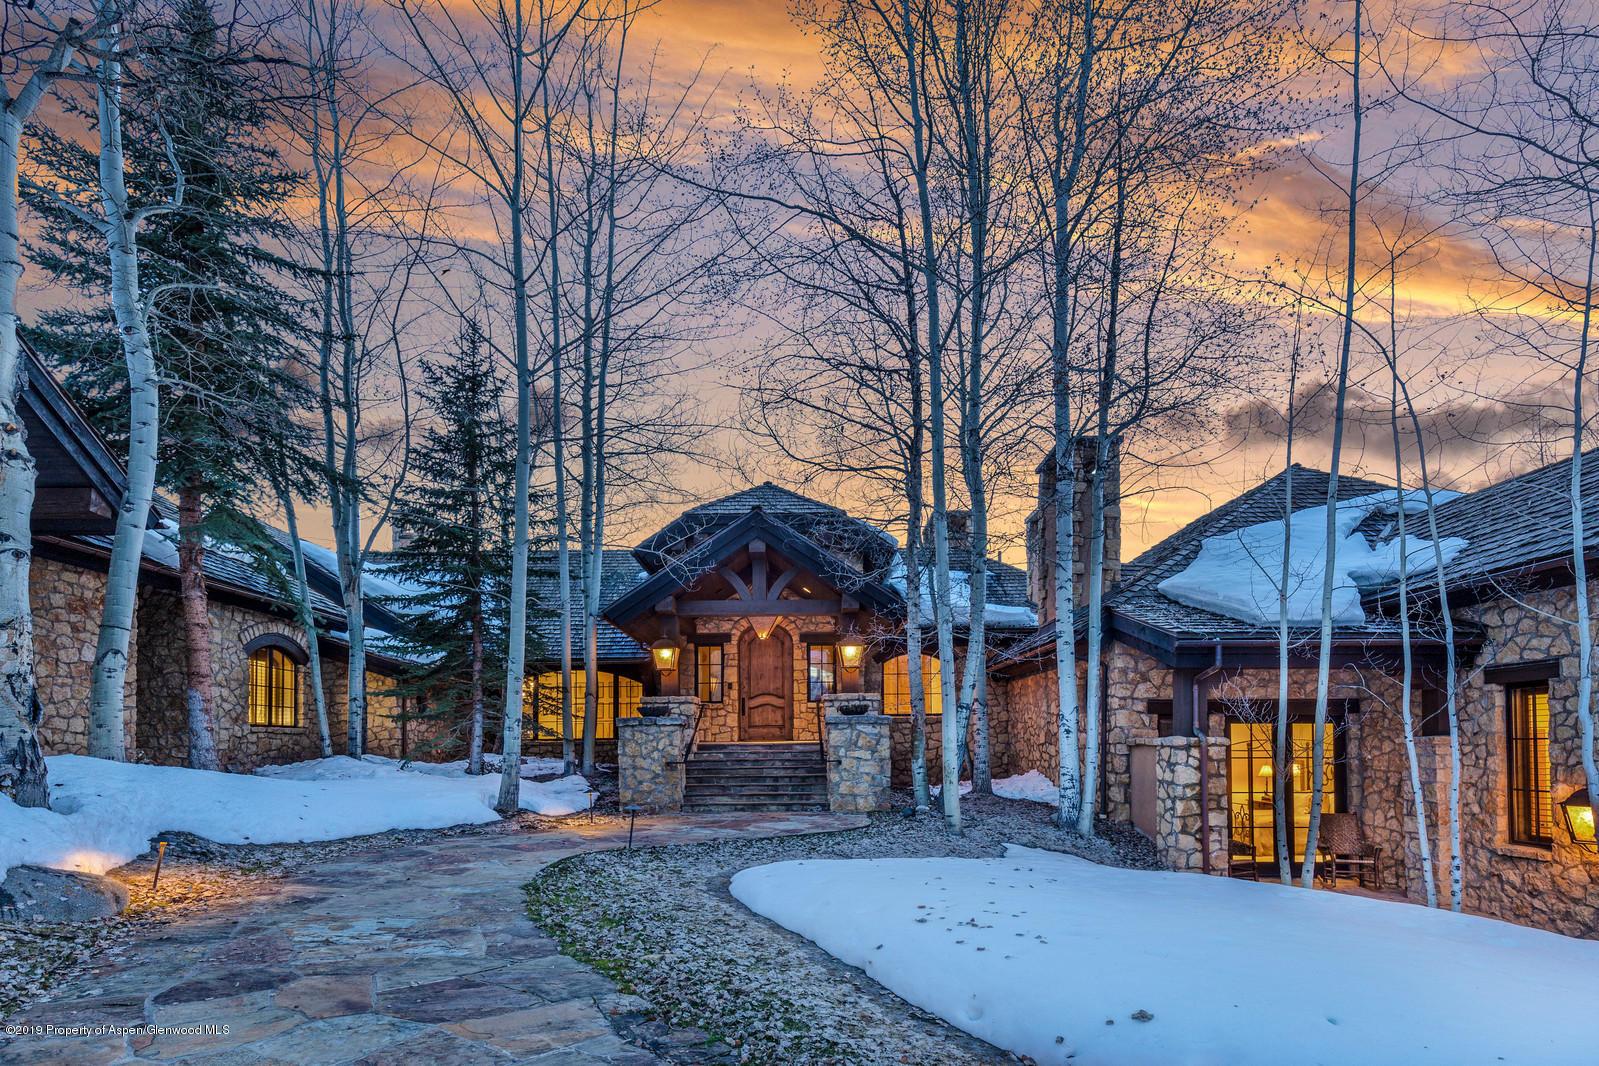 124 Coldstream Lane - Snowmass Village, Colorado